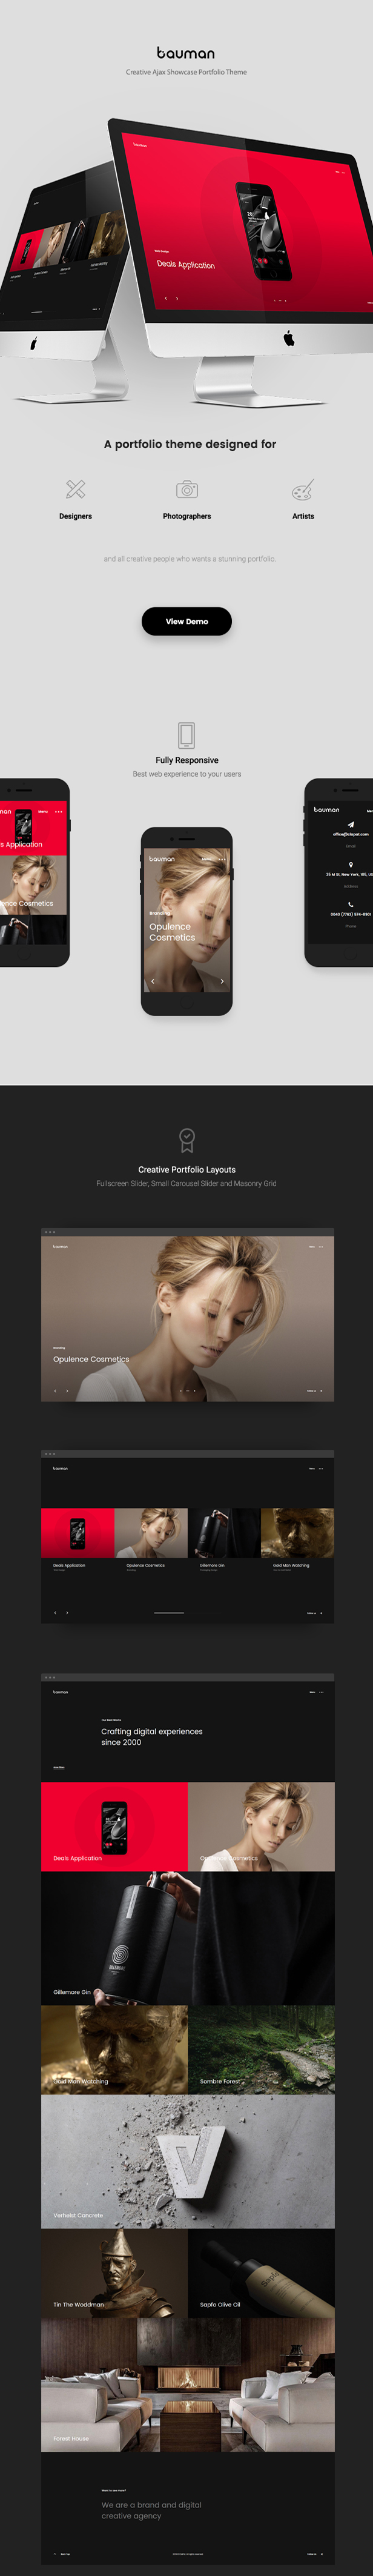 Bauman - 高端产品展示摄影网站 WordPress 模板